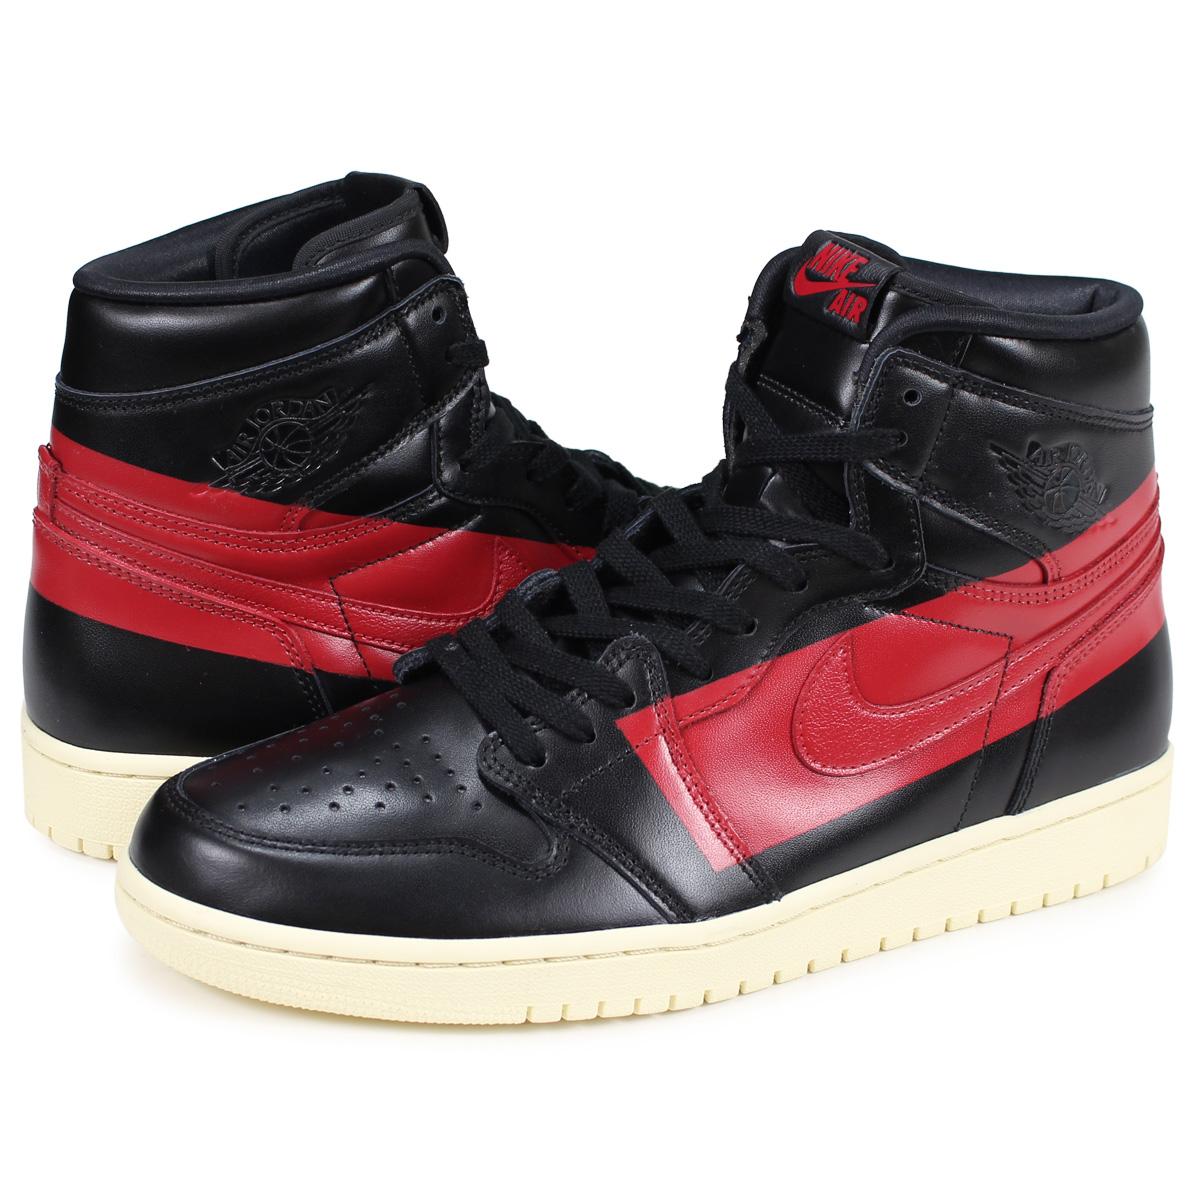 a6427d3face Nike NIKE Air Jordan 1 nostalgic high sneakers men AIR JORDAN 1 RETRO HIGH  OG DEFIANT ...